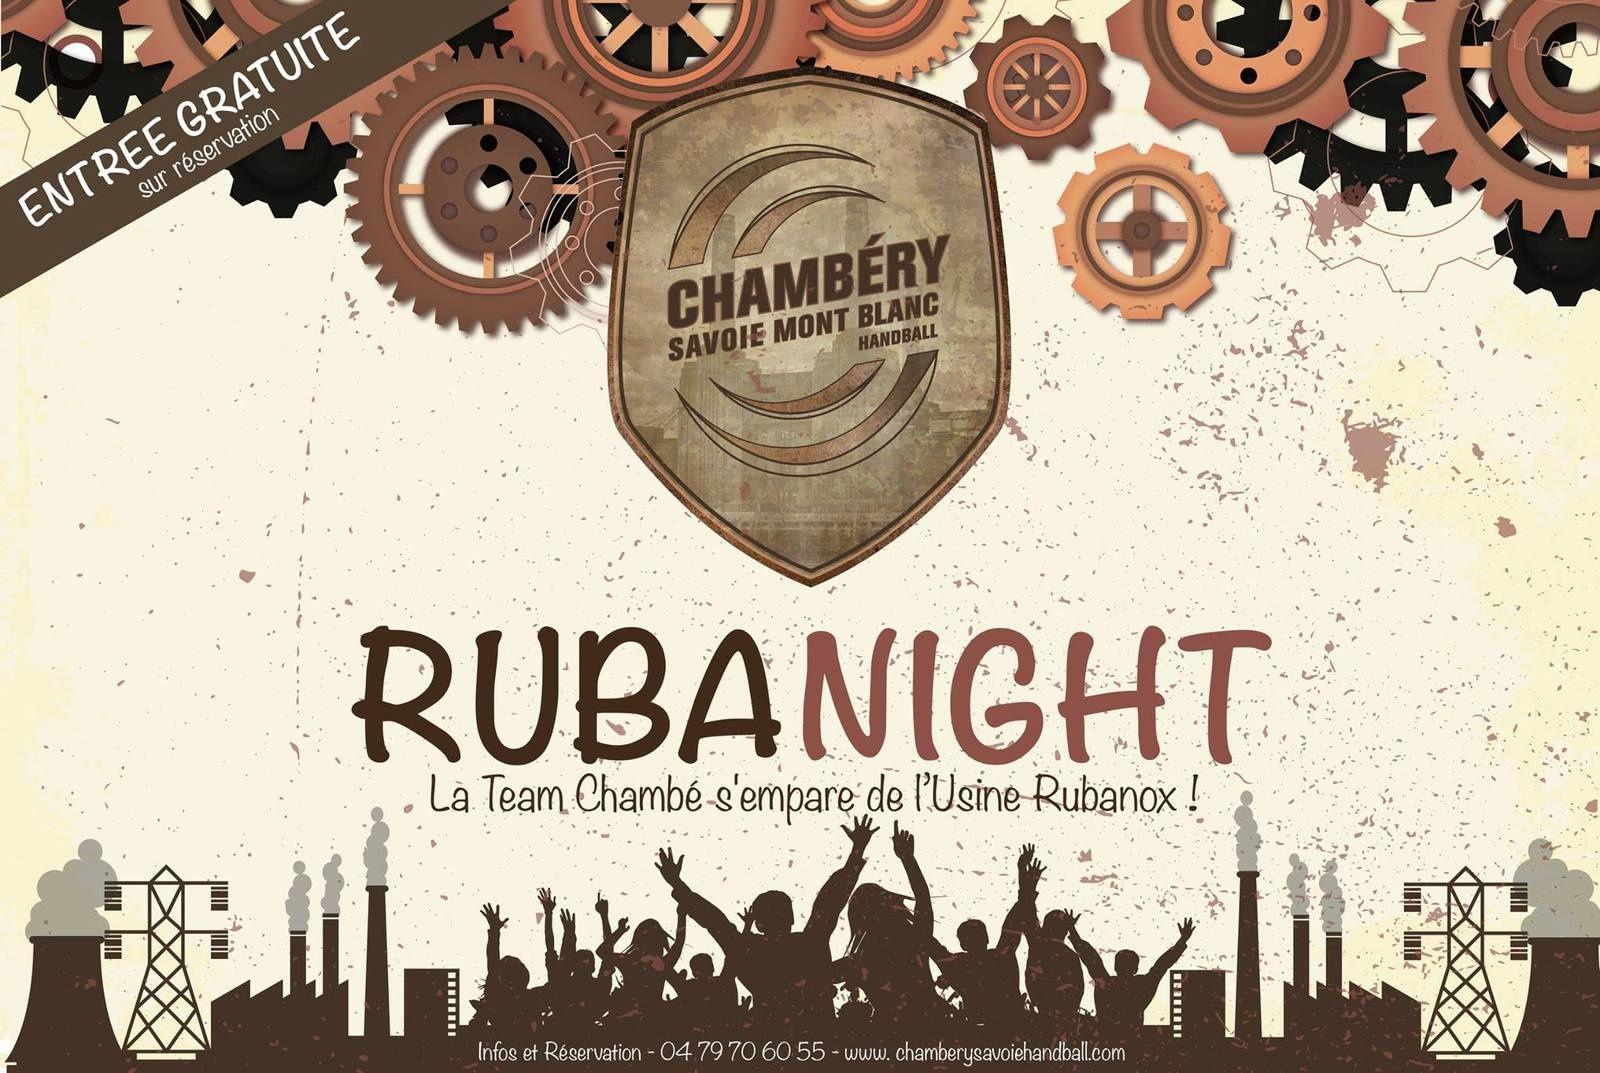 RUBANIGHT LA TEAM CHAMBE S'EMPARE DE L'USINE RUBANOX !